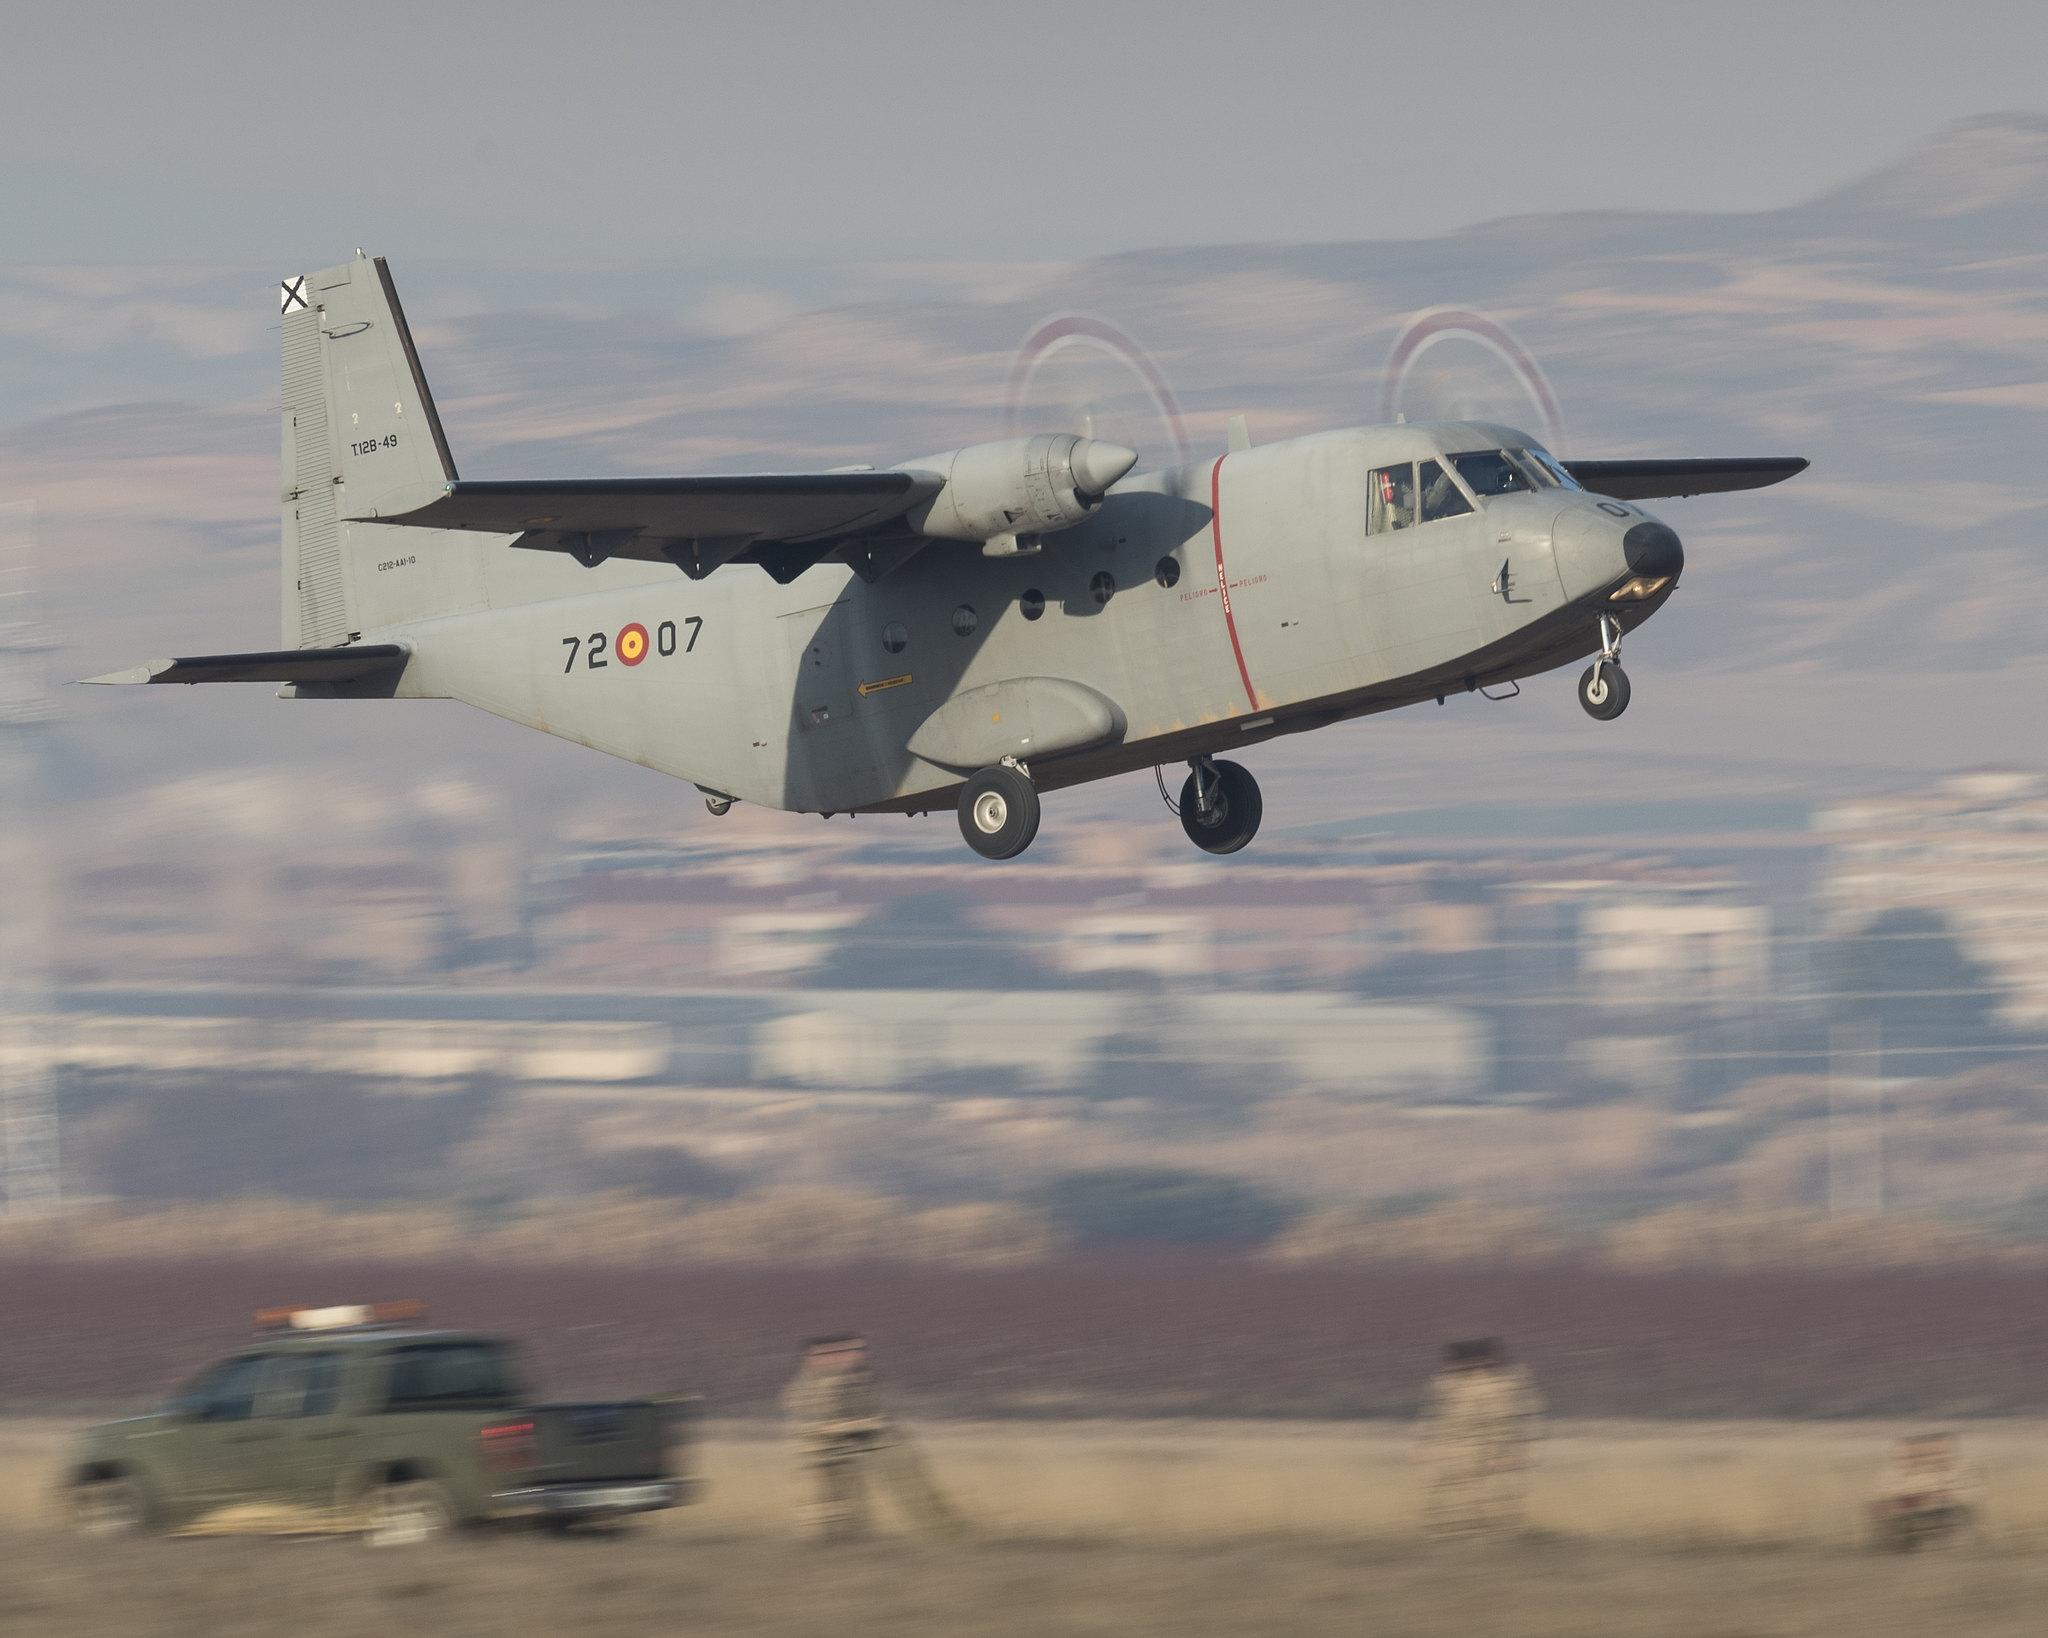 Aeronave Casa C-212 -Aviocar- (T-12)